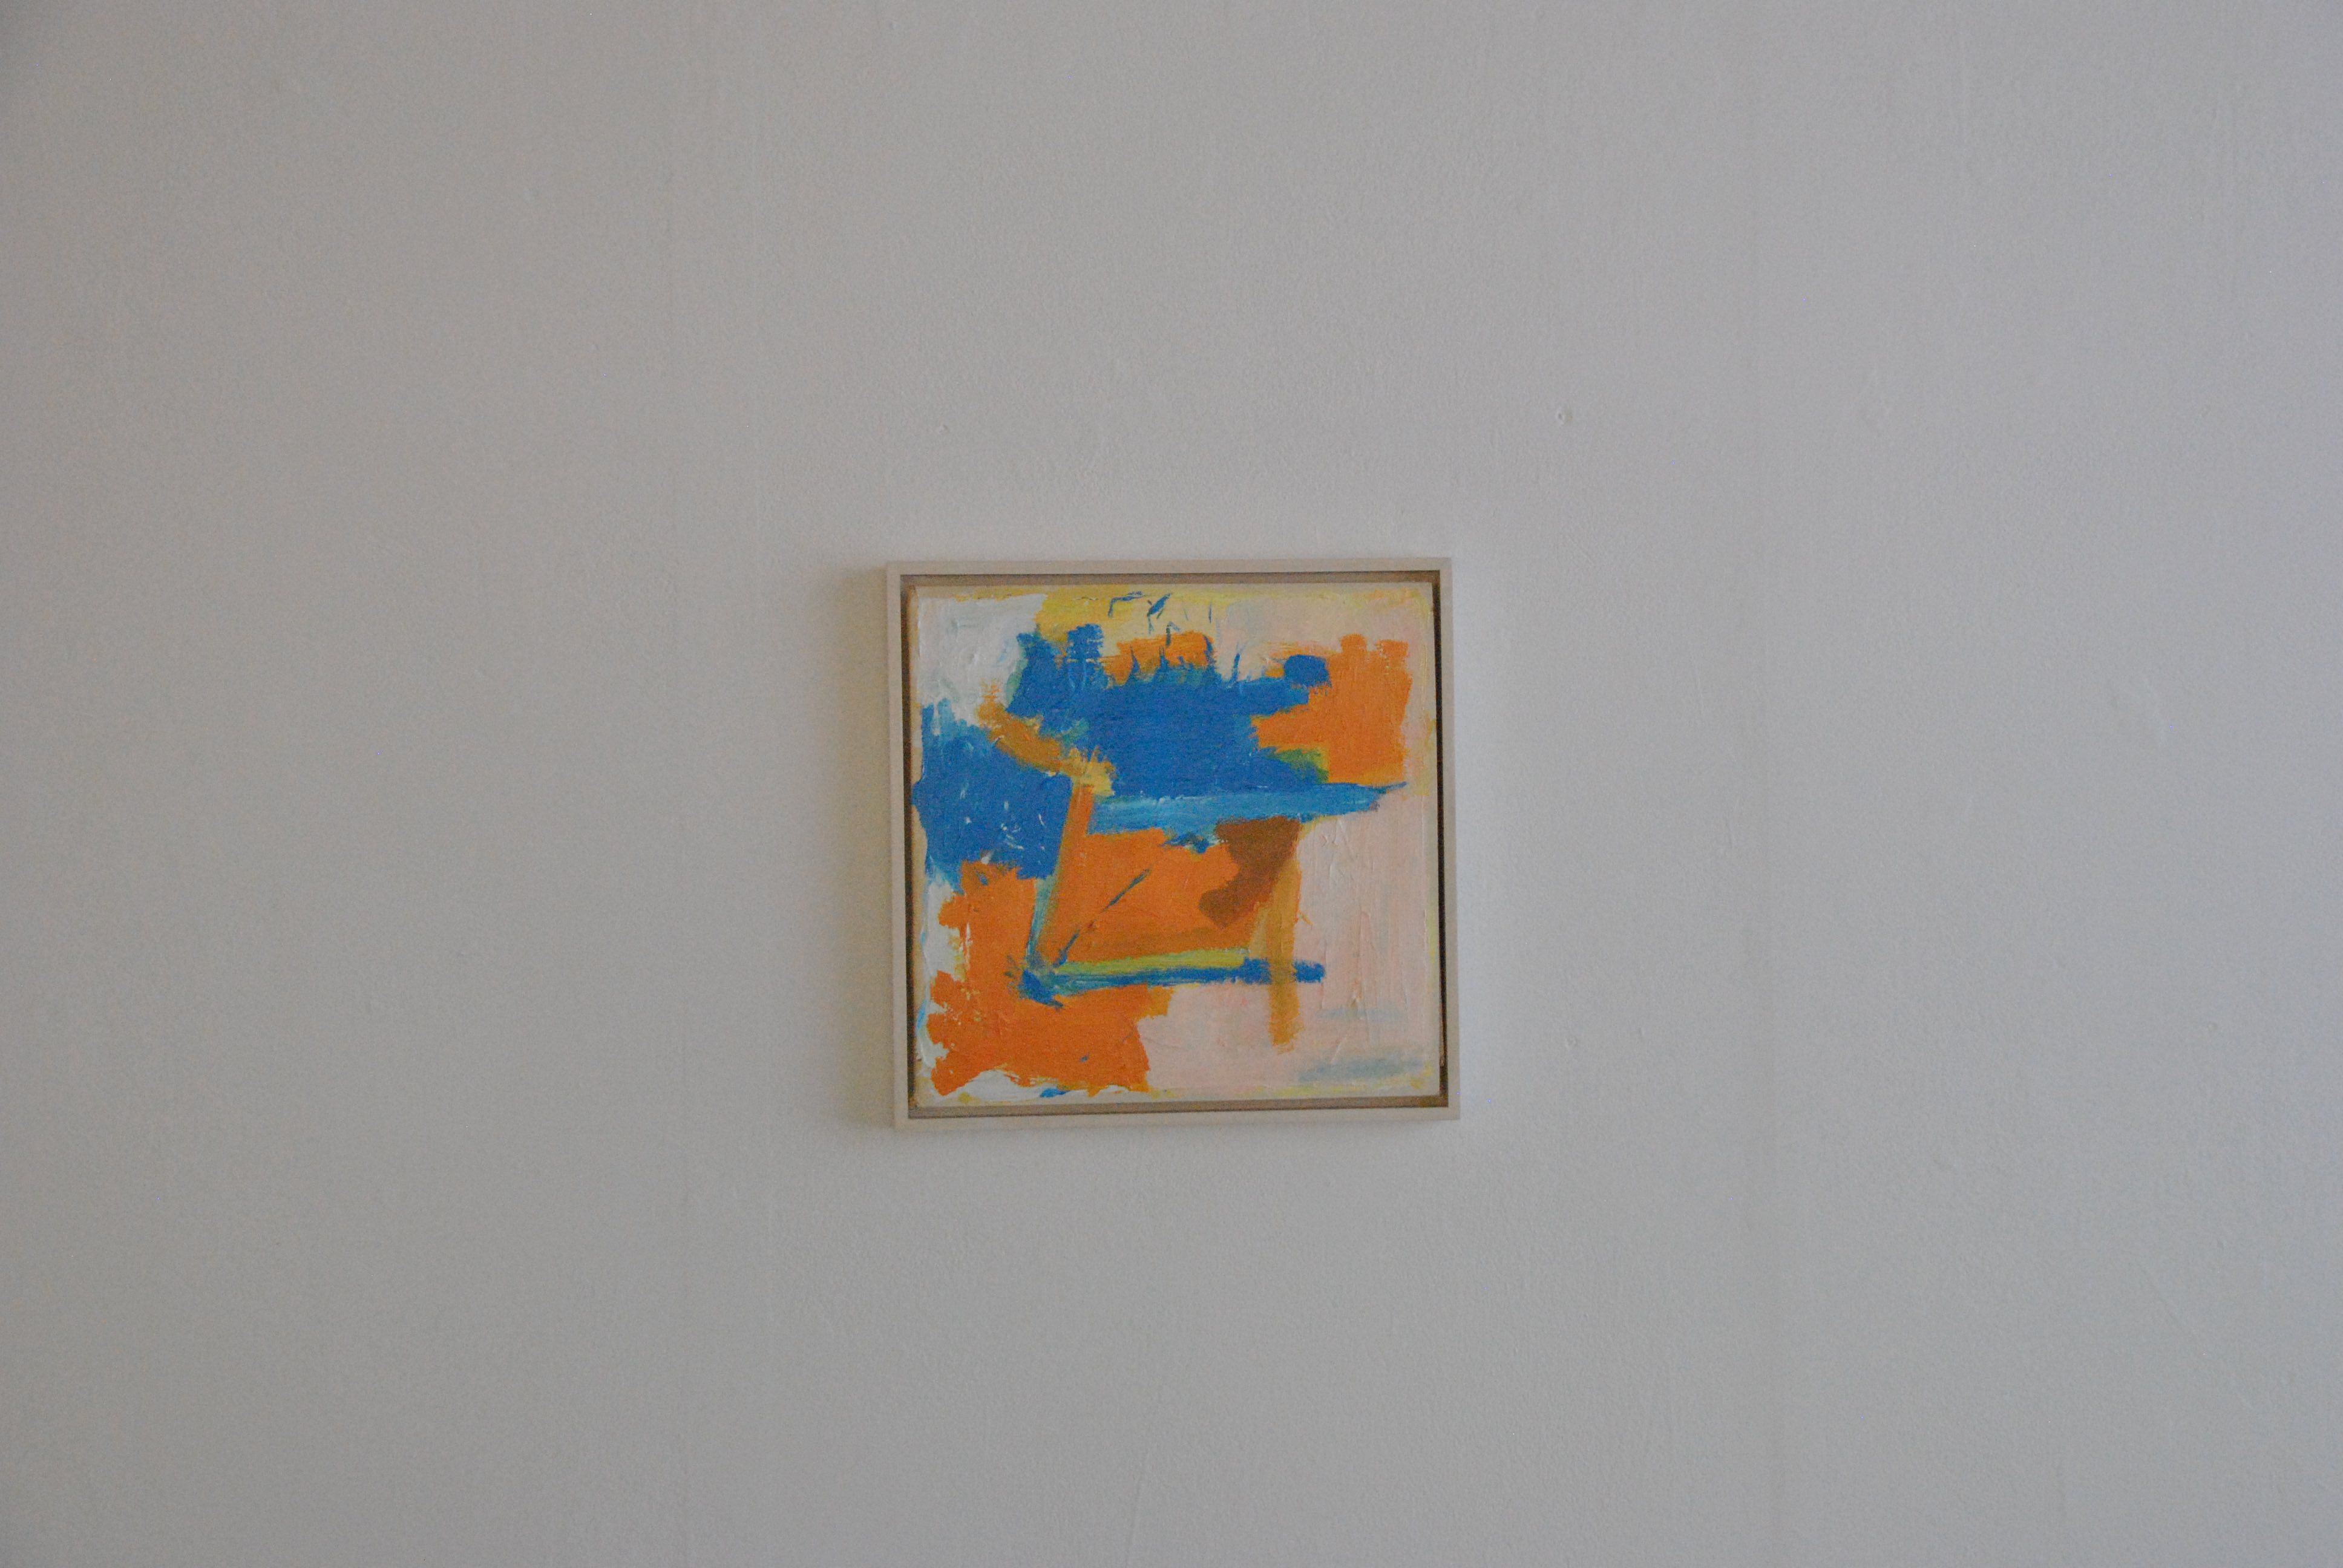 A Good Idea is a Good Idea (De Kooning), 2012, Dan Rees. Herbert Read Gallery. ©51zero